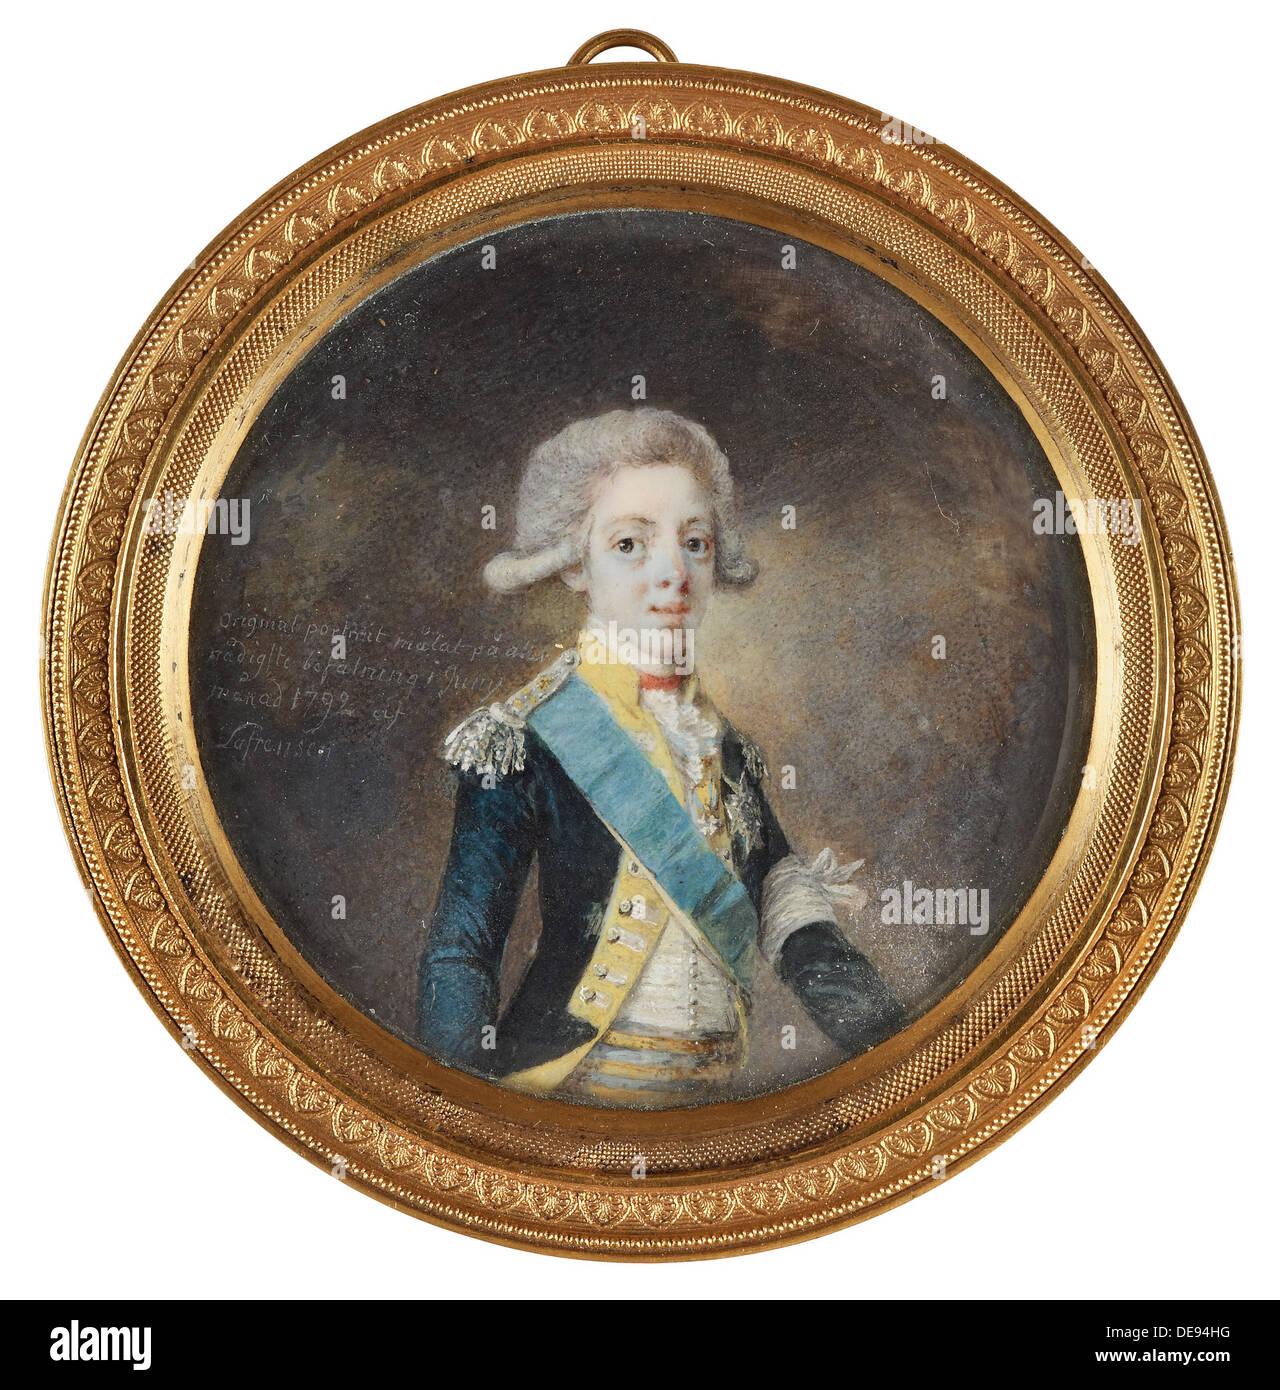 Portrait of Gustav IV Adolf of Sweden, 1792. Artist: Lafrensen, Niclas (1737-1807) - Stock Image